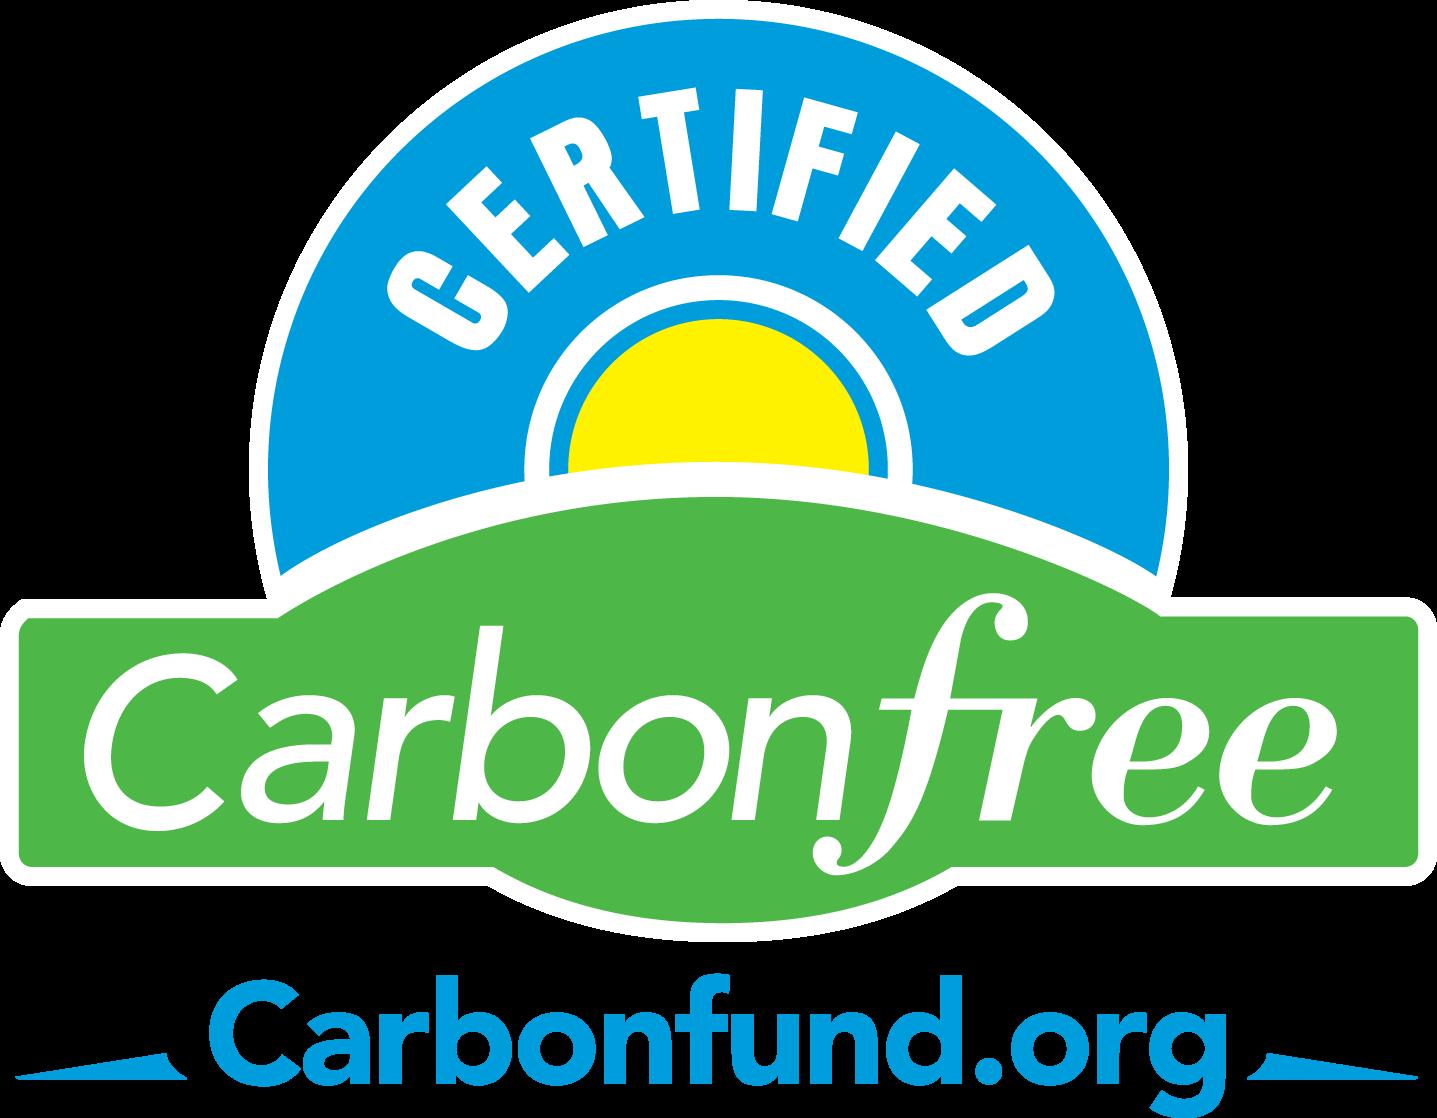 Carbonfree Certified